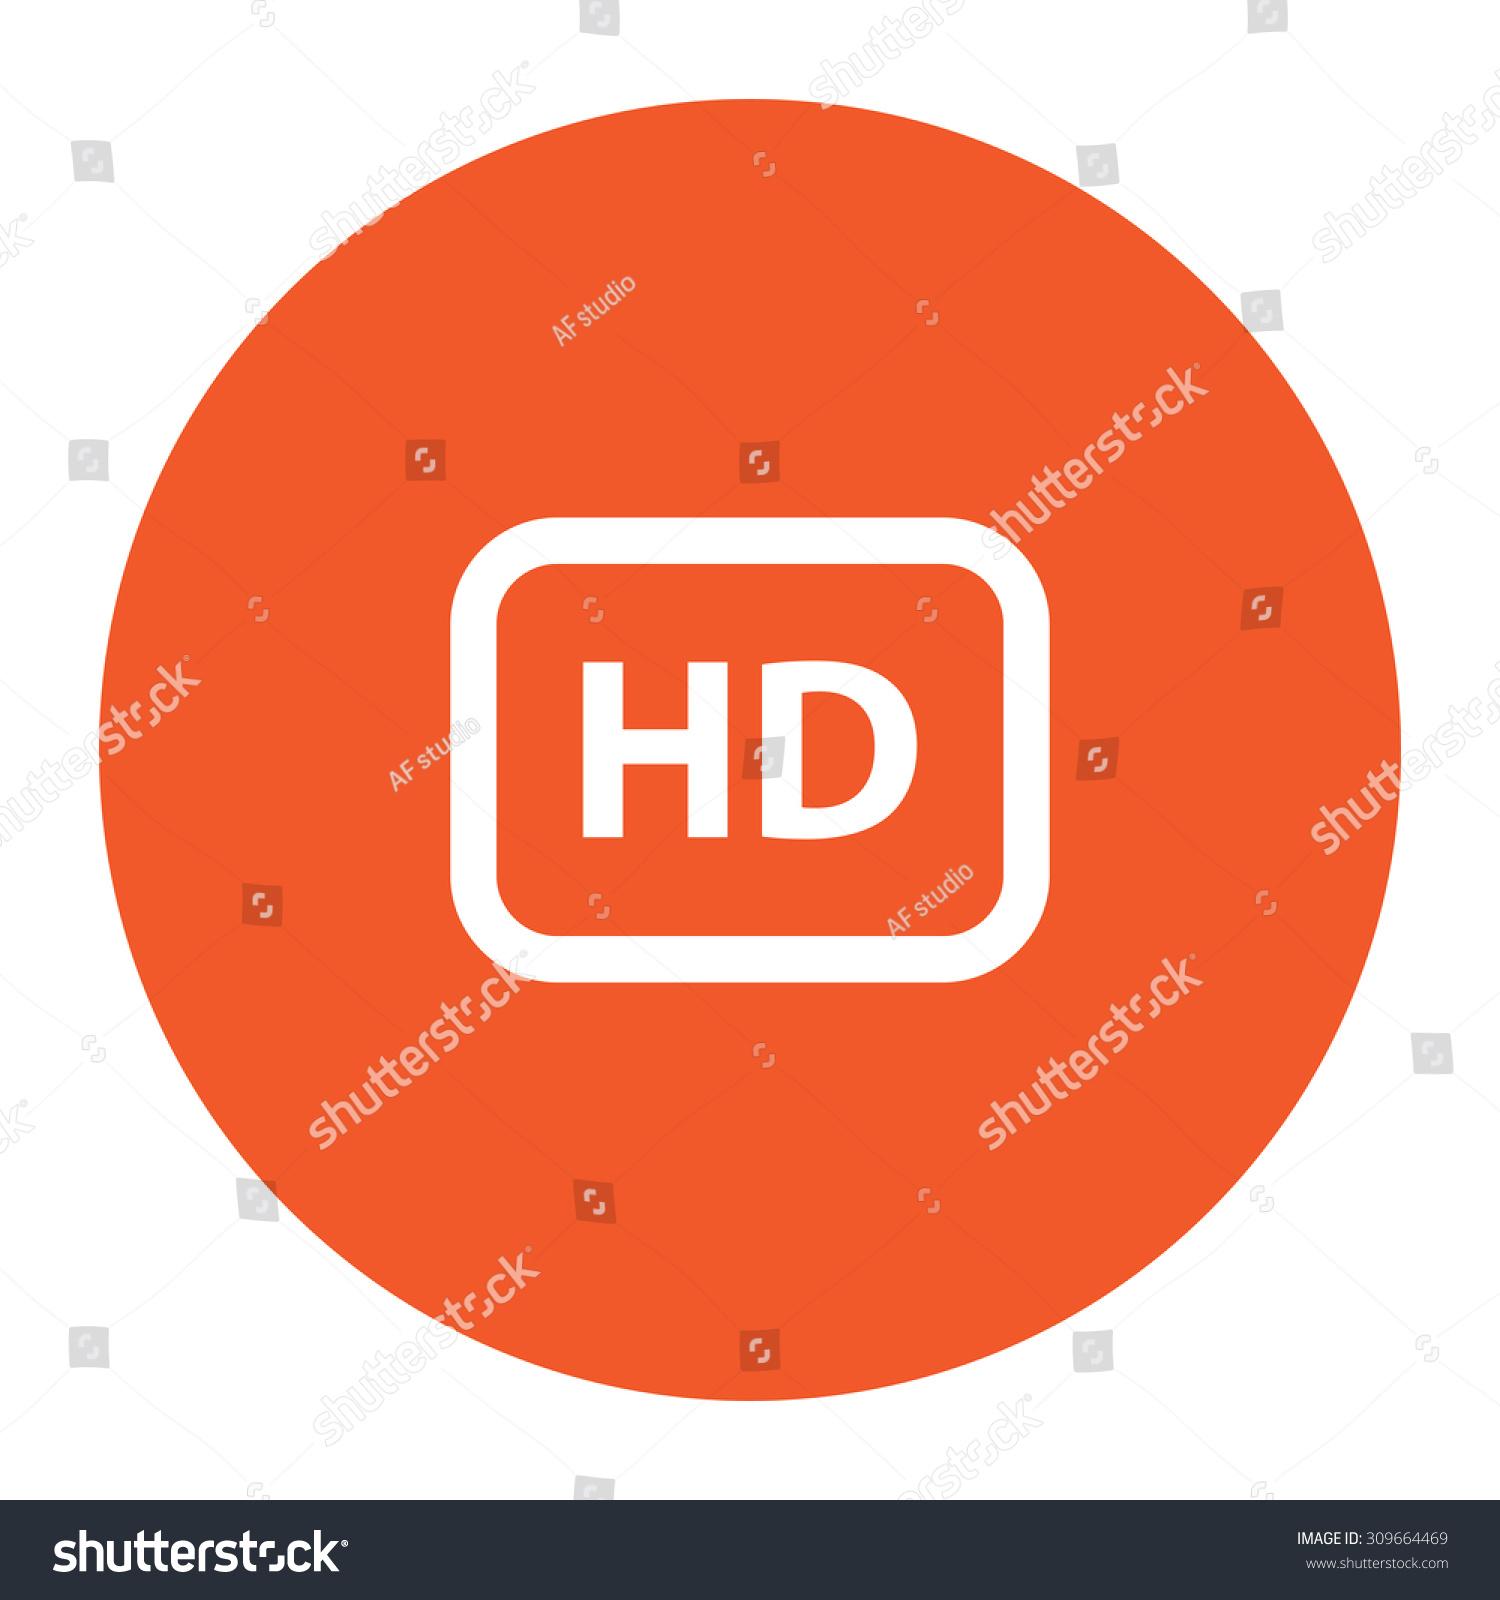 Hd word button flat white symbol stock vector 309664469 shutterstock hd word button flat white symbol in the orange circle vector illustration icon buycottarizona